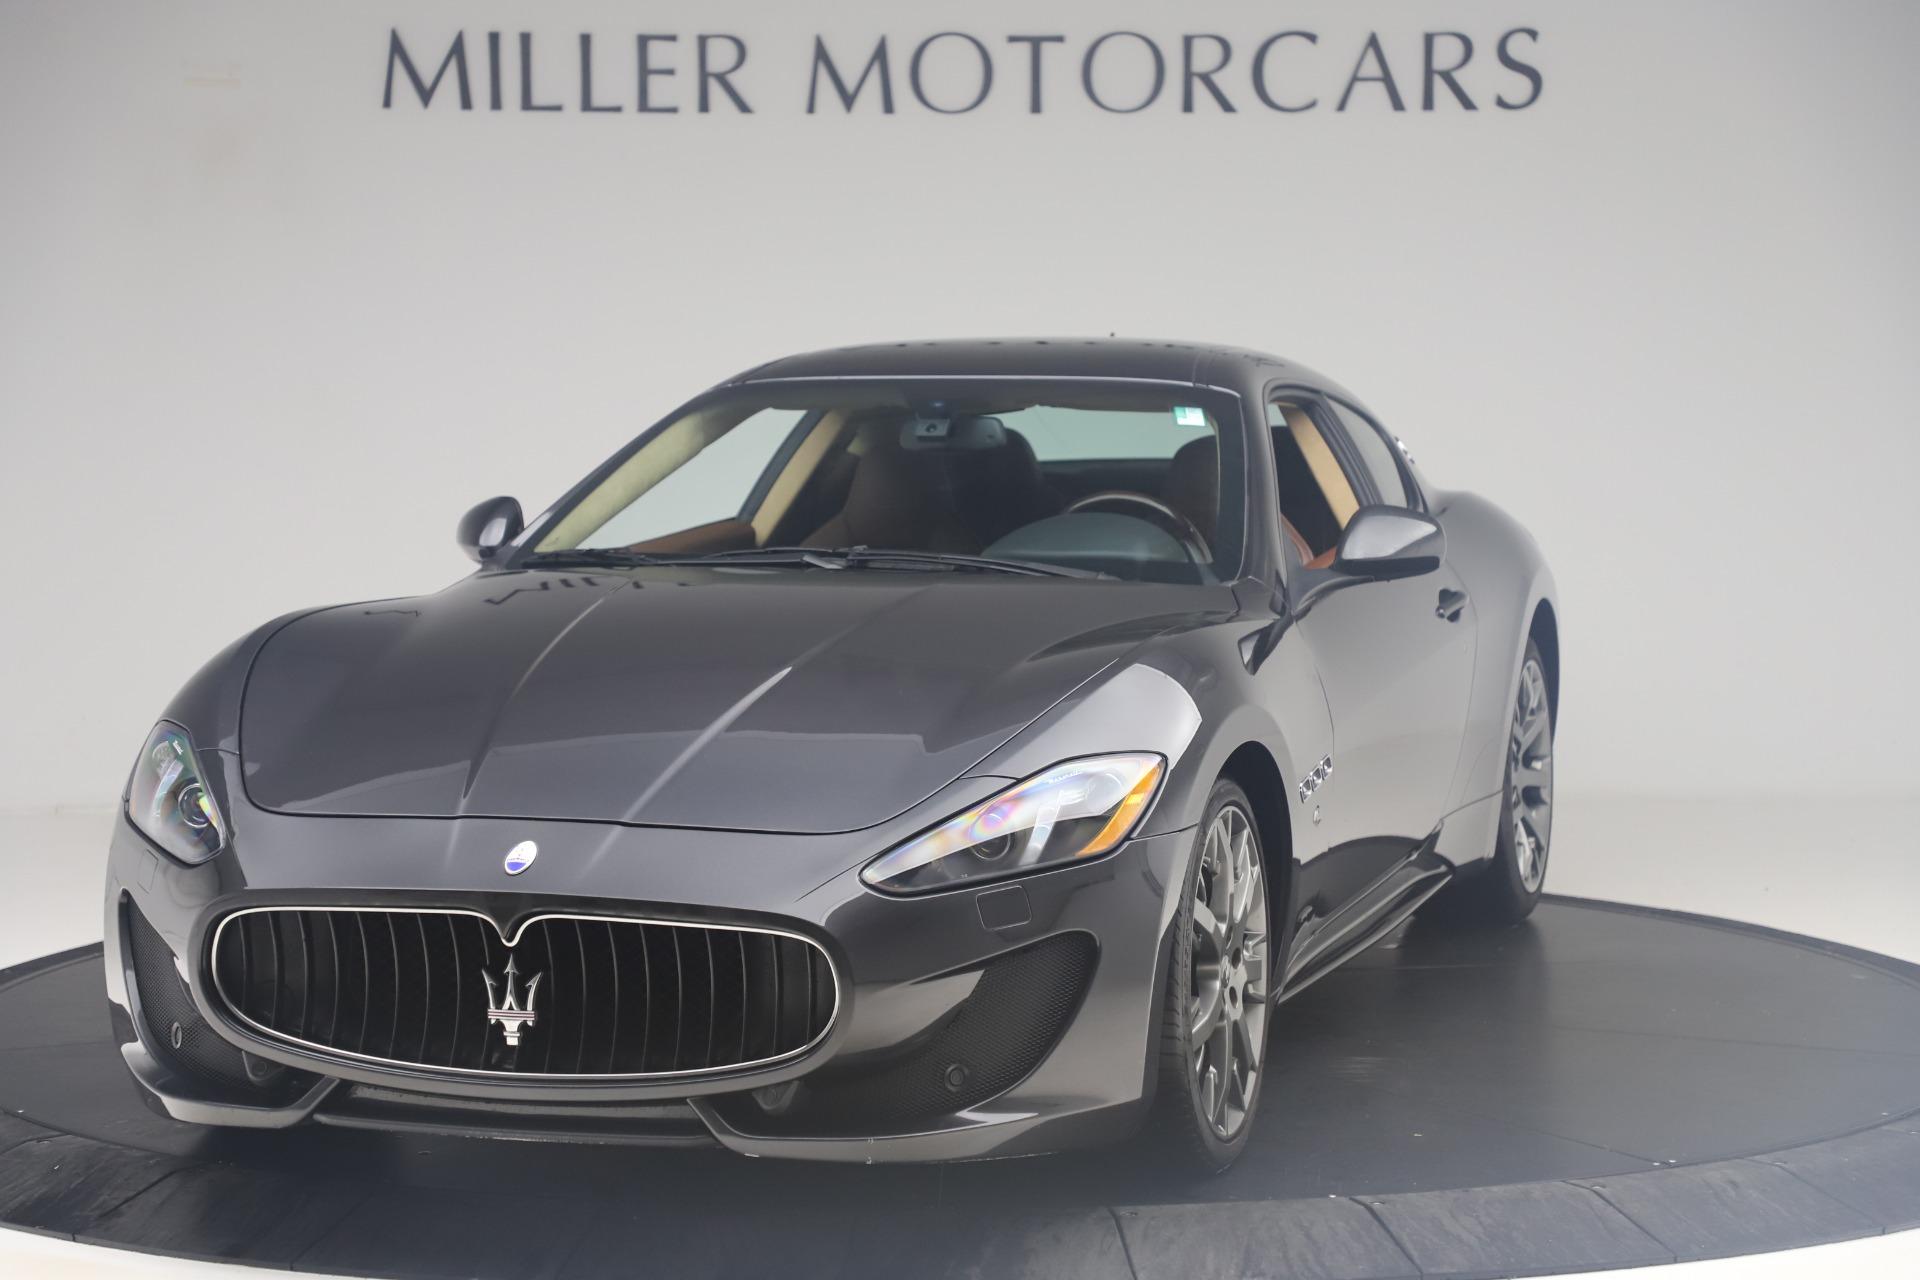 New 2016 Maserati GranTurismo Sport For Sale In Westport, CT 164_main